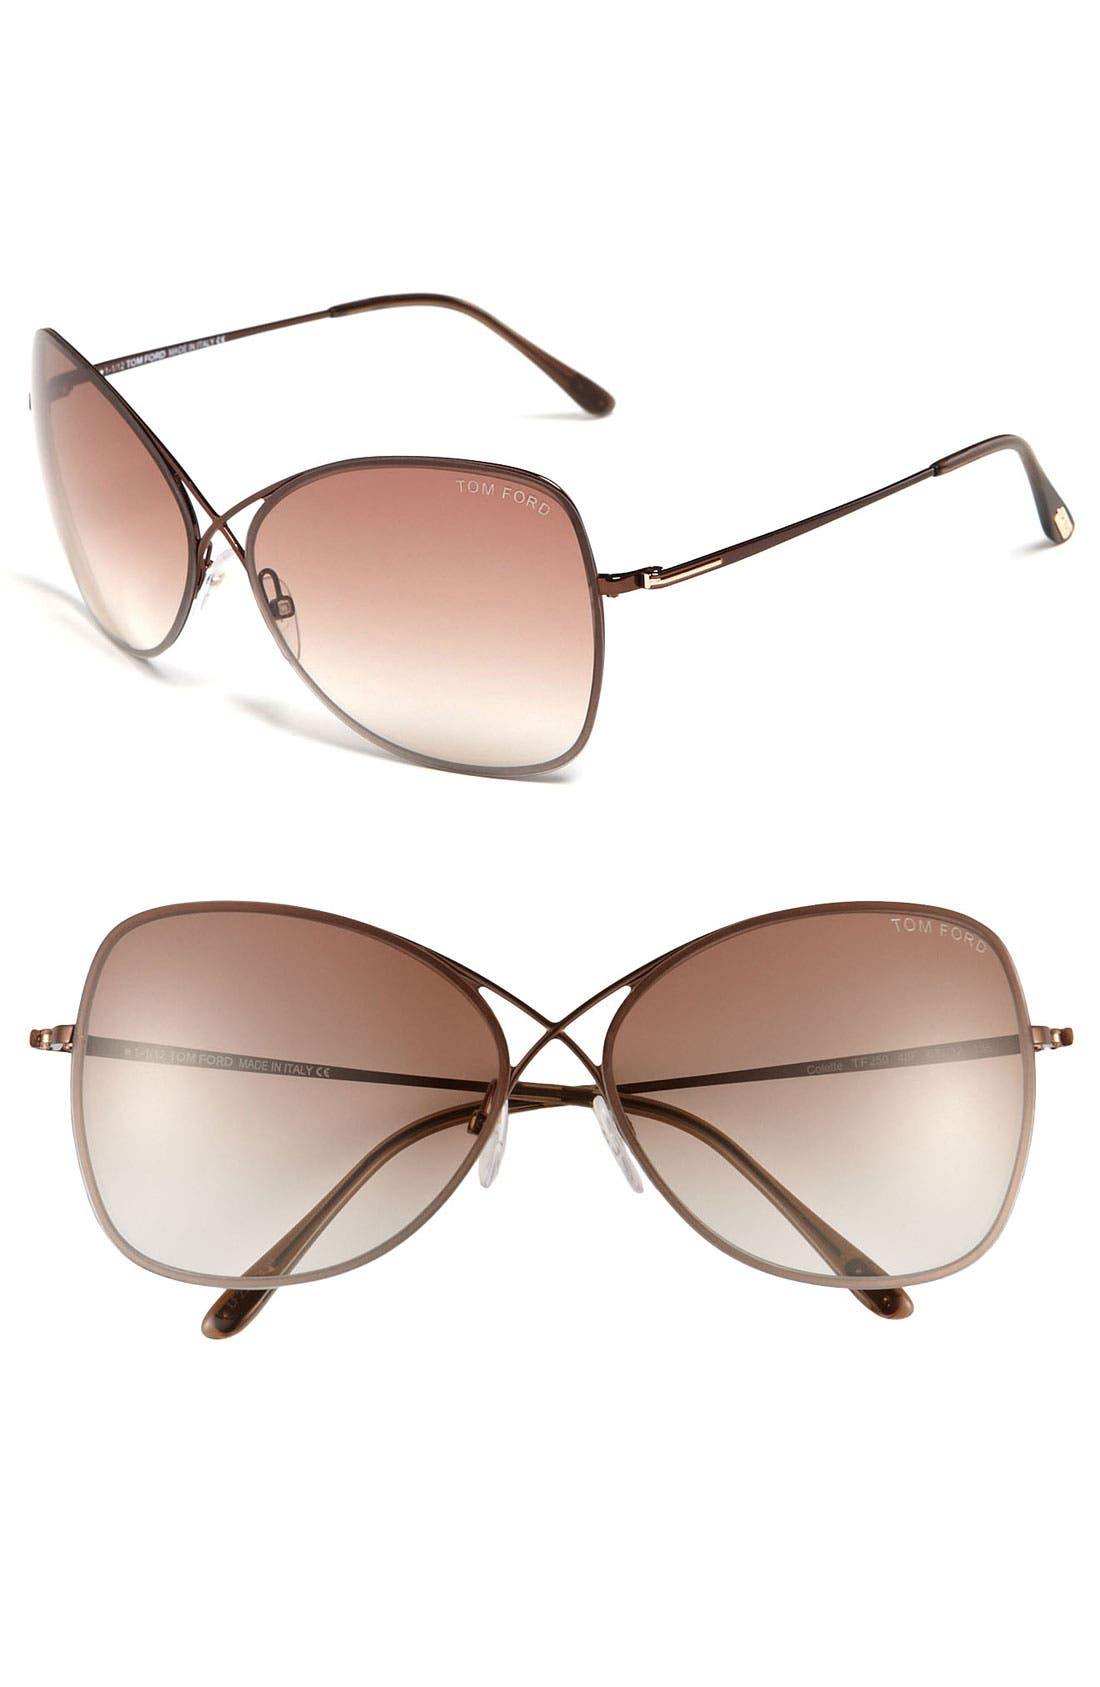 'Colette' 63mm Oversized Sunglasses,                             Main thumbnail 1, color,                             Shiny Brown/ Brown Gradient